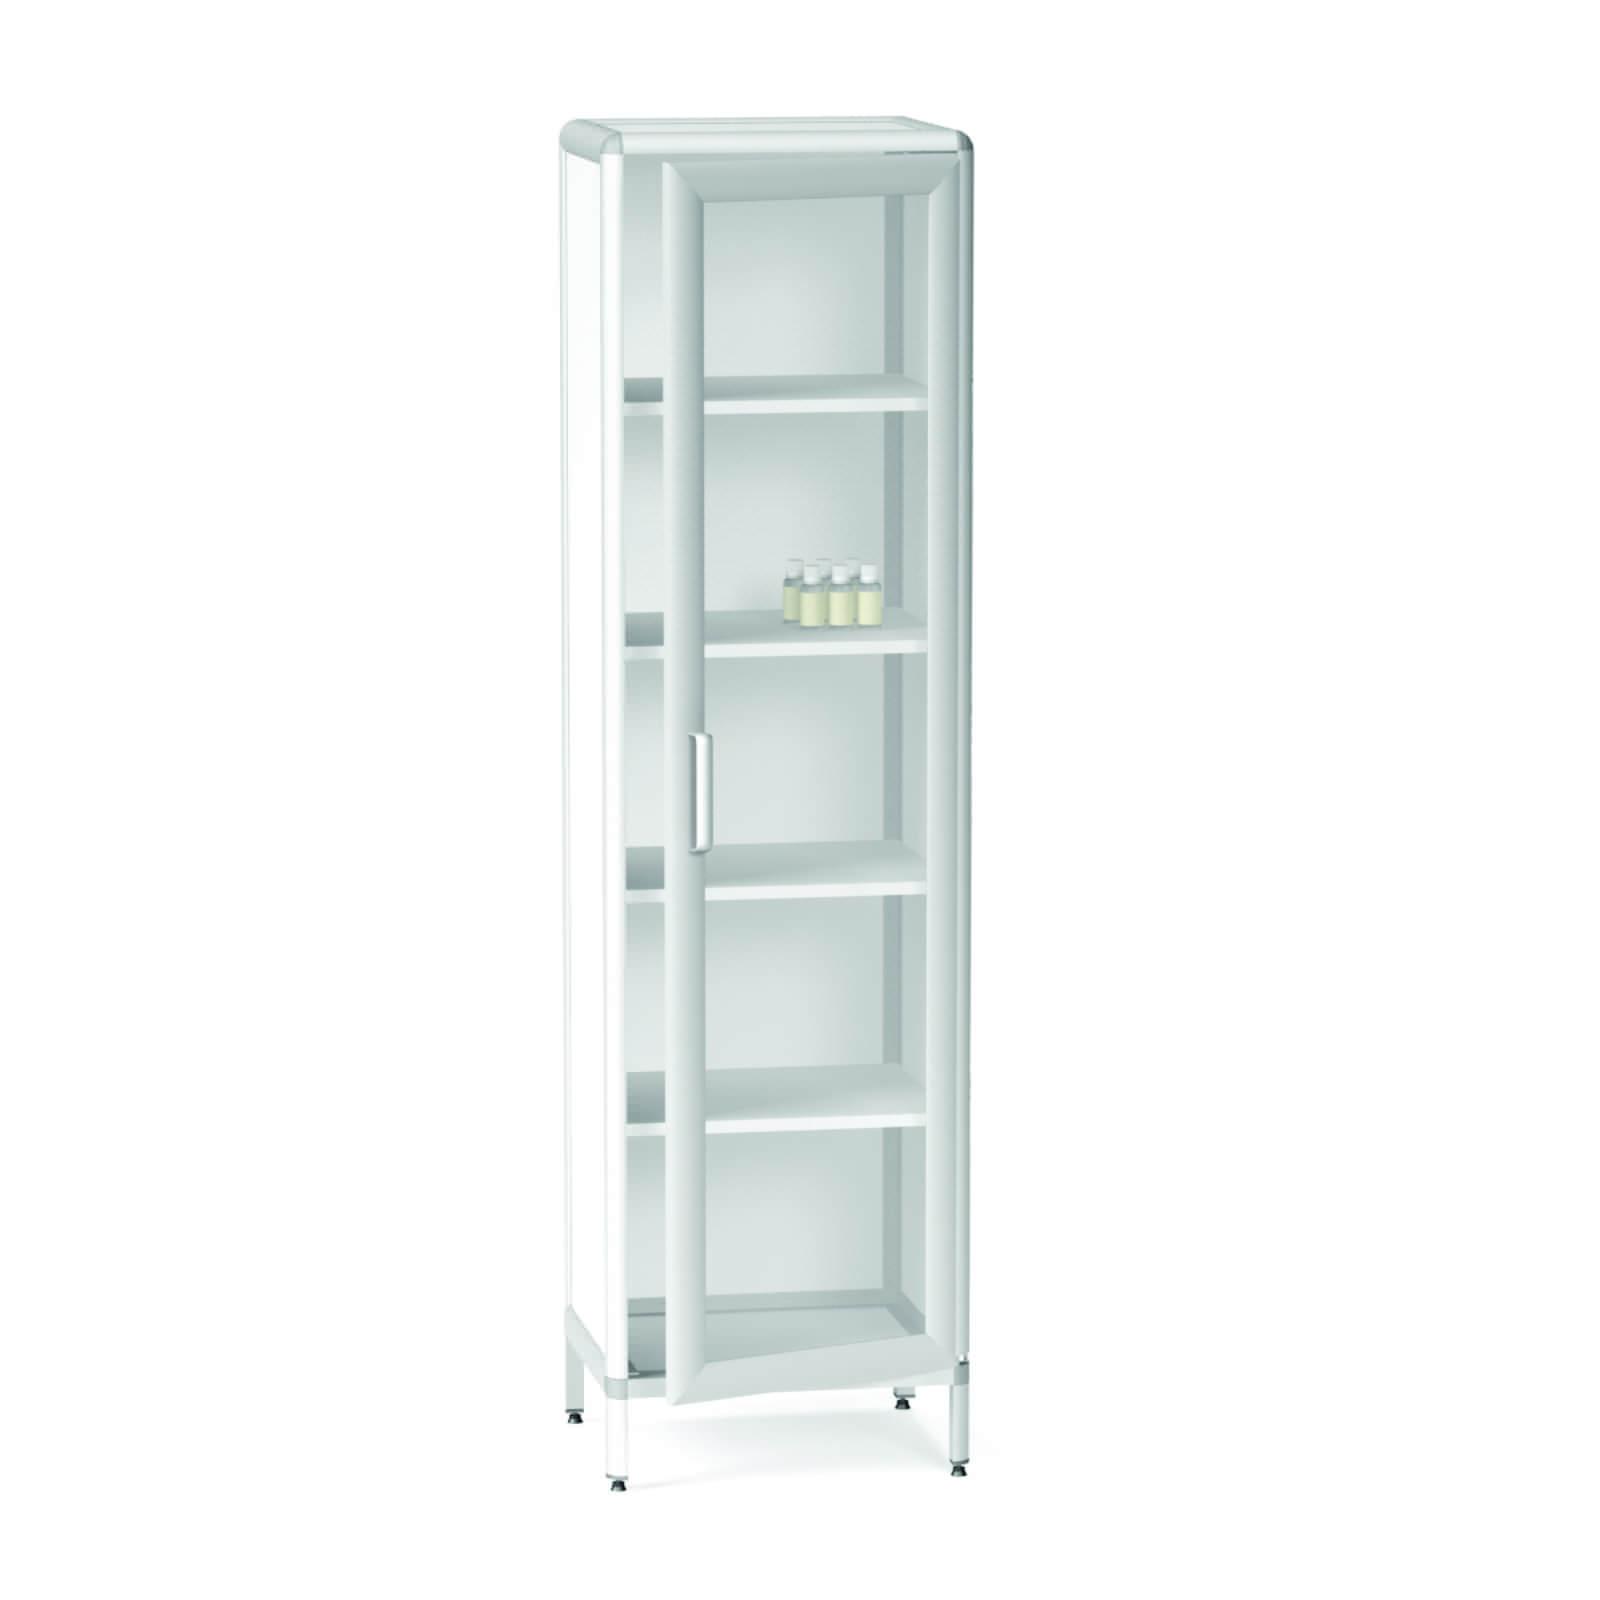 Медицинский шкаф ДМ-2-001-01